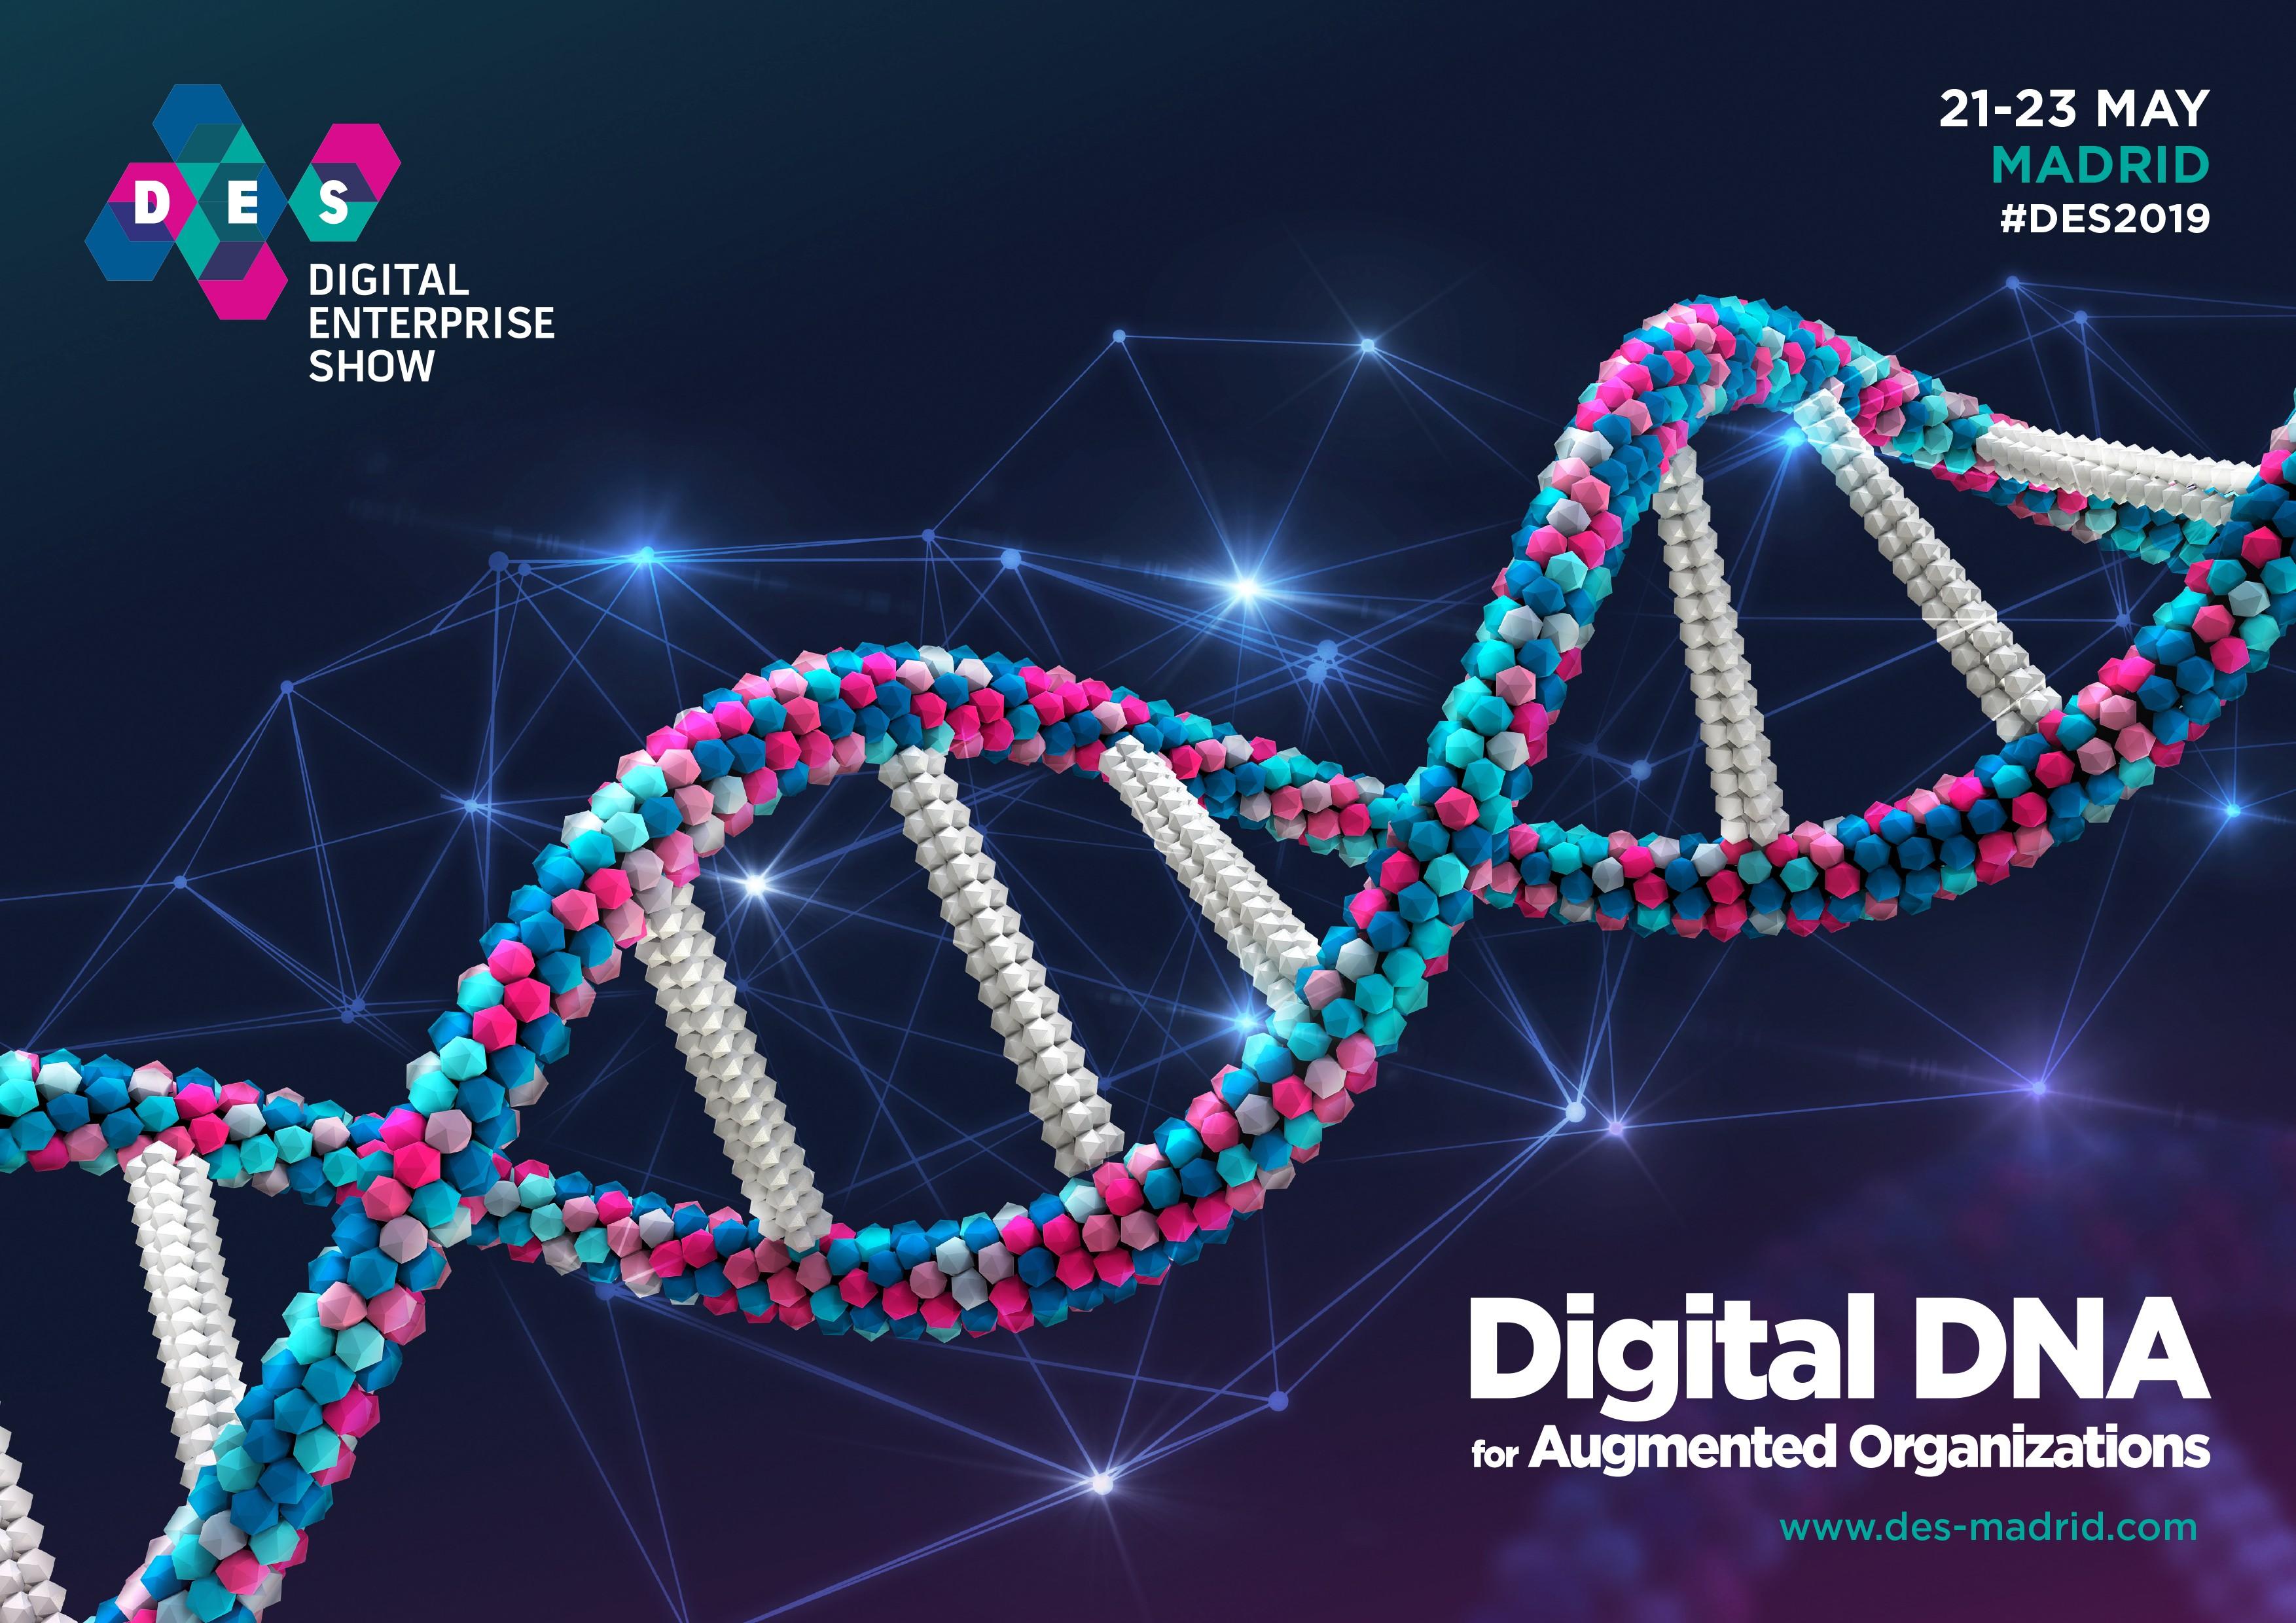 DES Digital Business World Congress World s Leading event on Digital Transformation Madrid 22 24 May